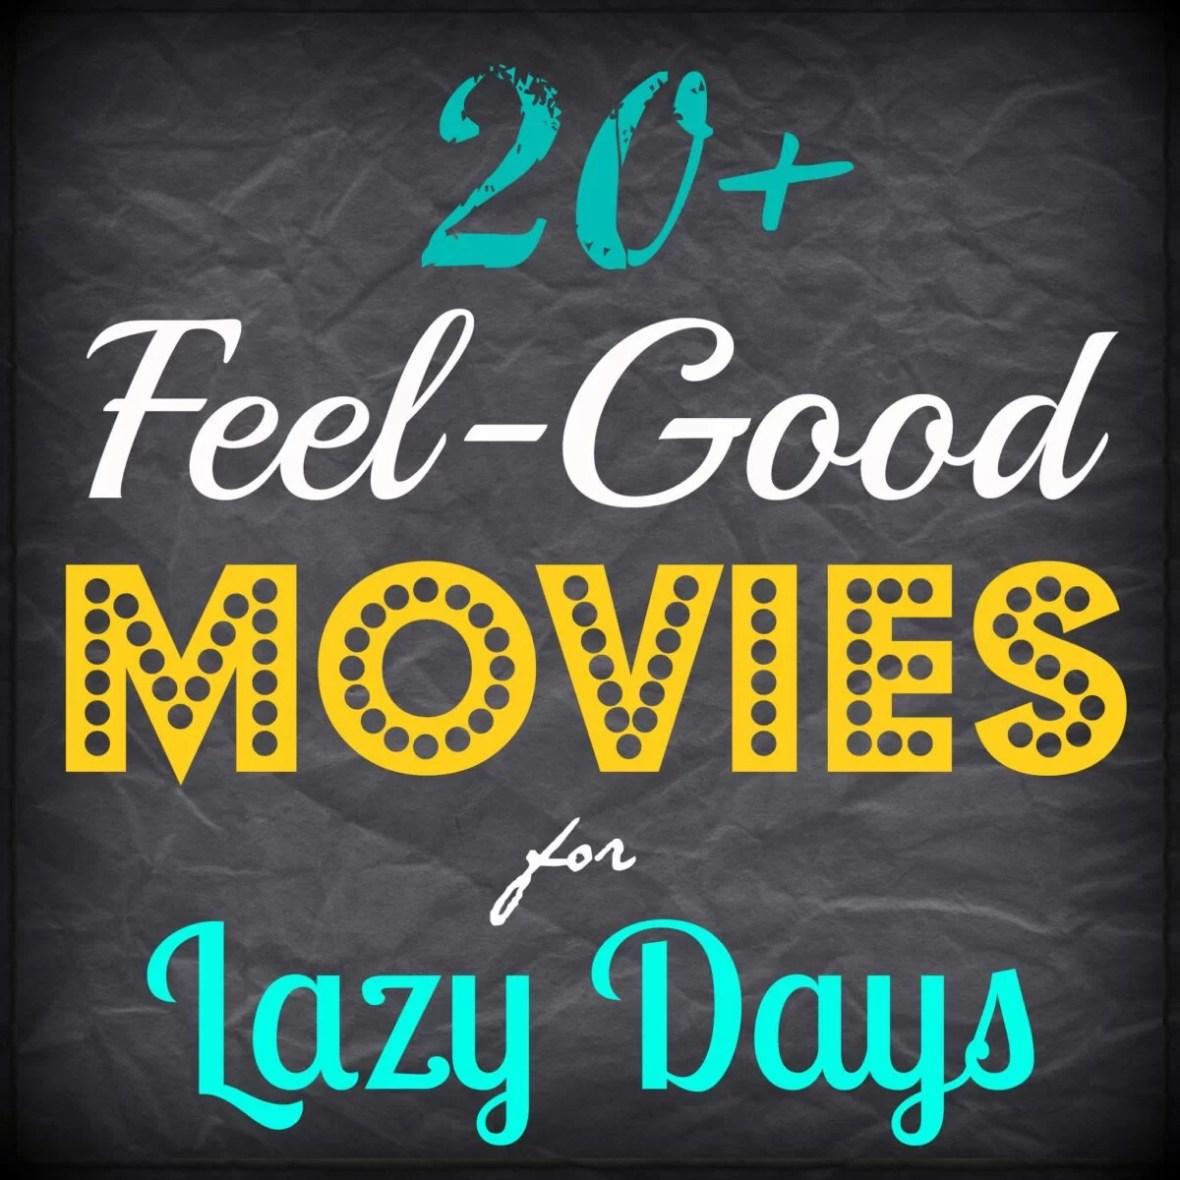 feel good films pic